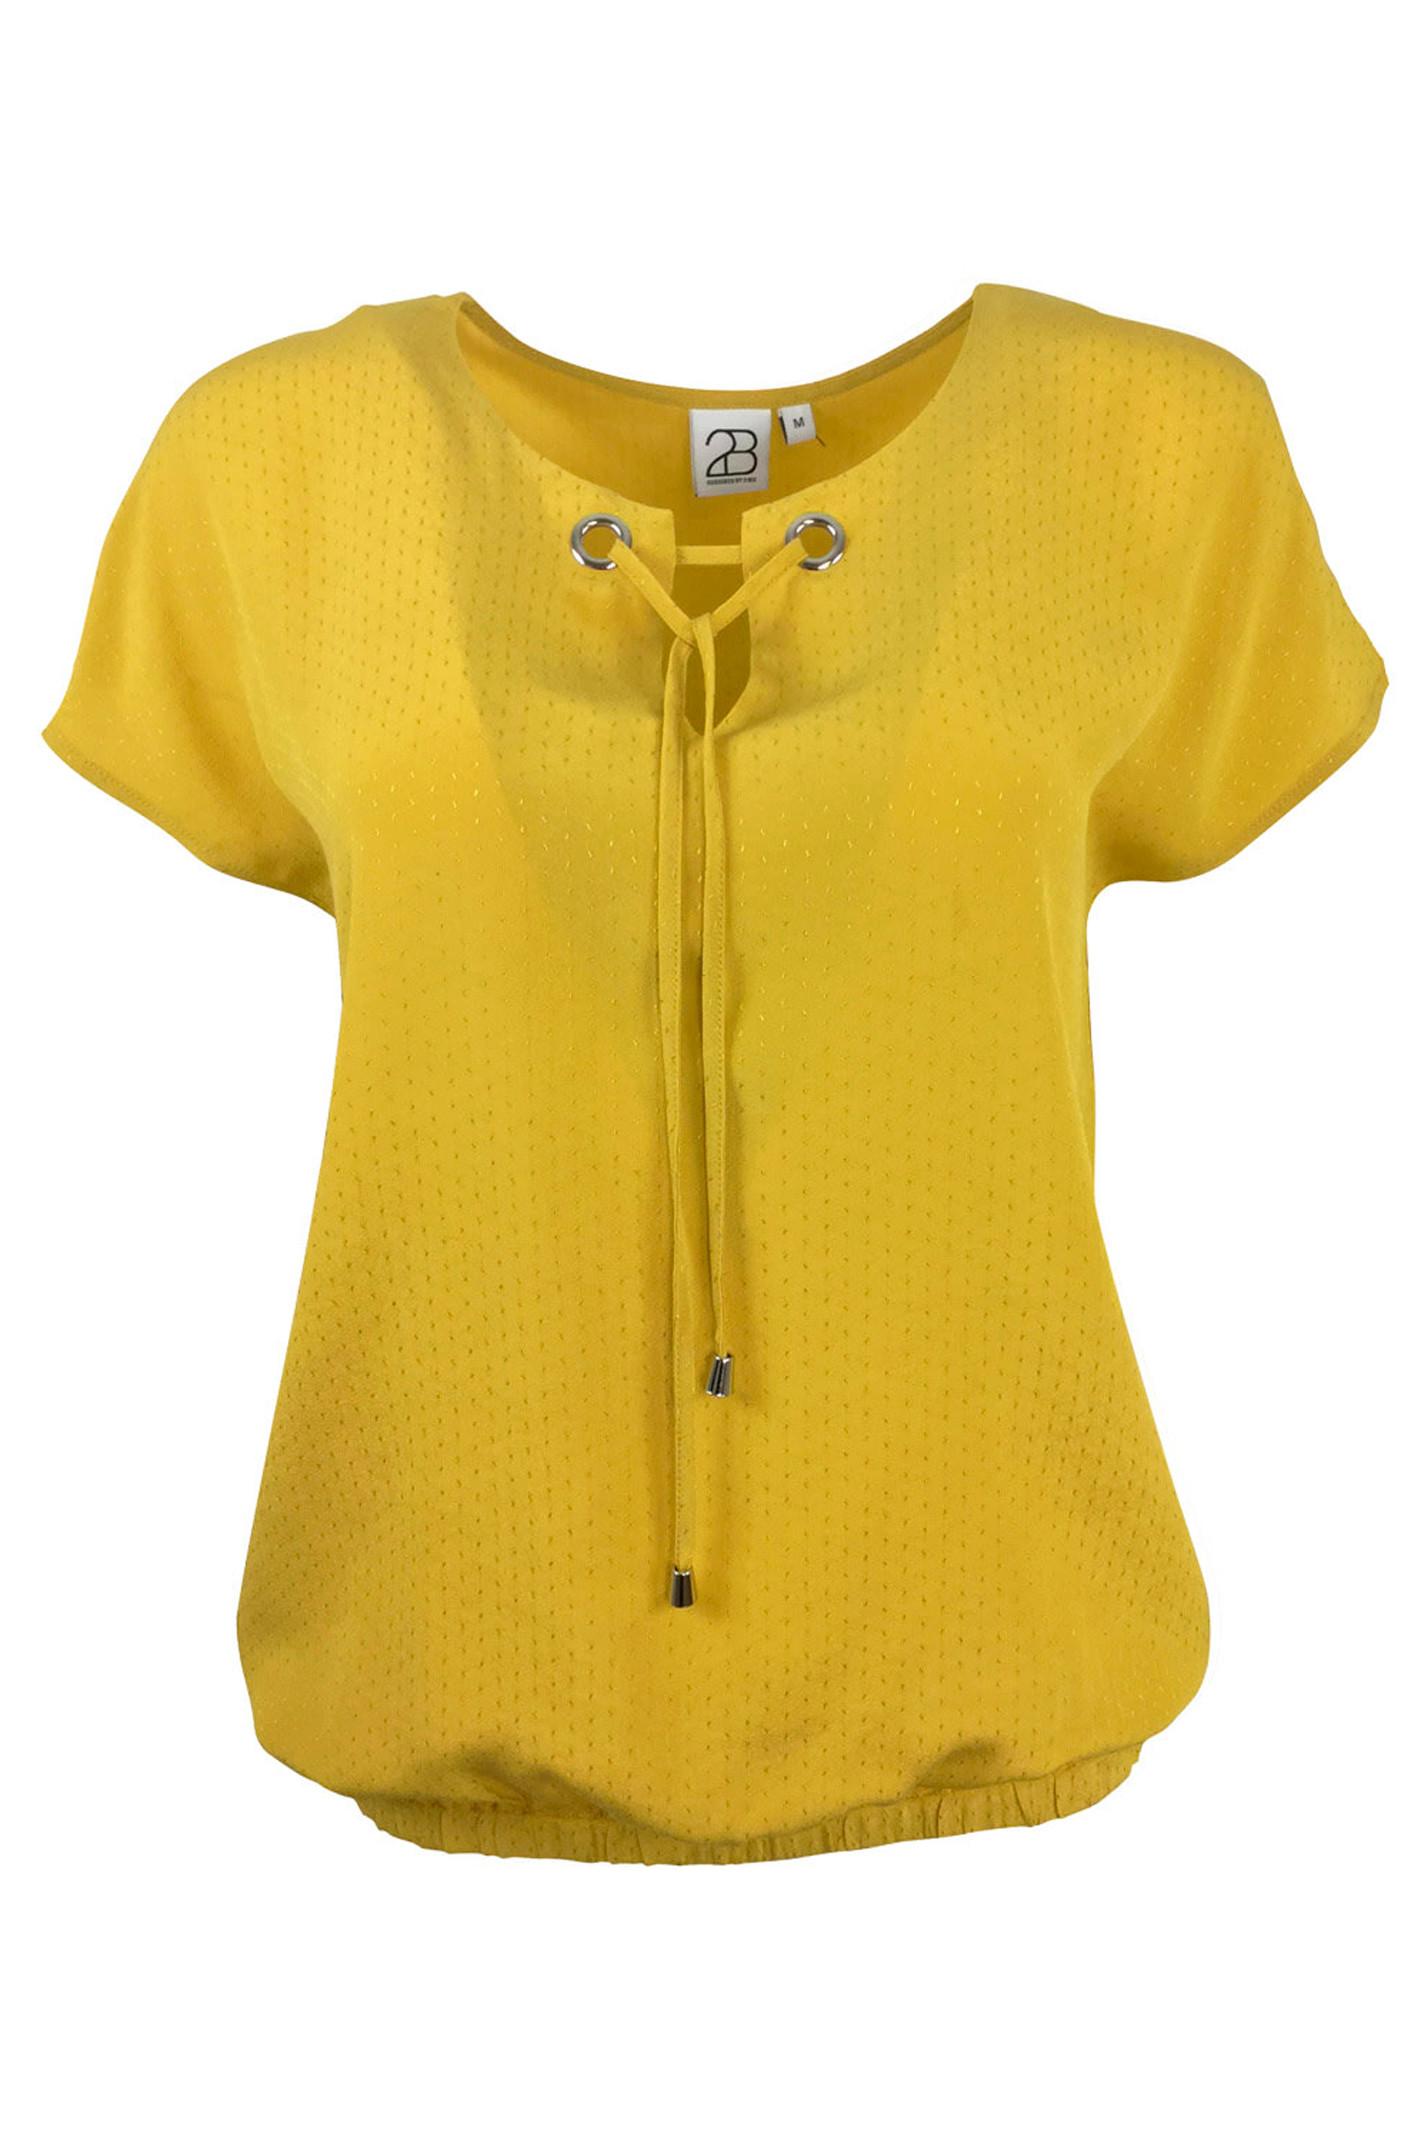 2-BIZ NORMAN Yellow